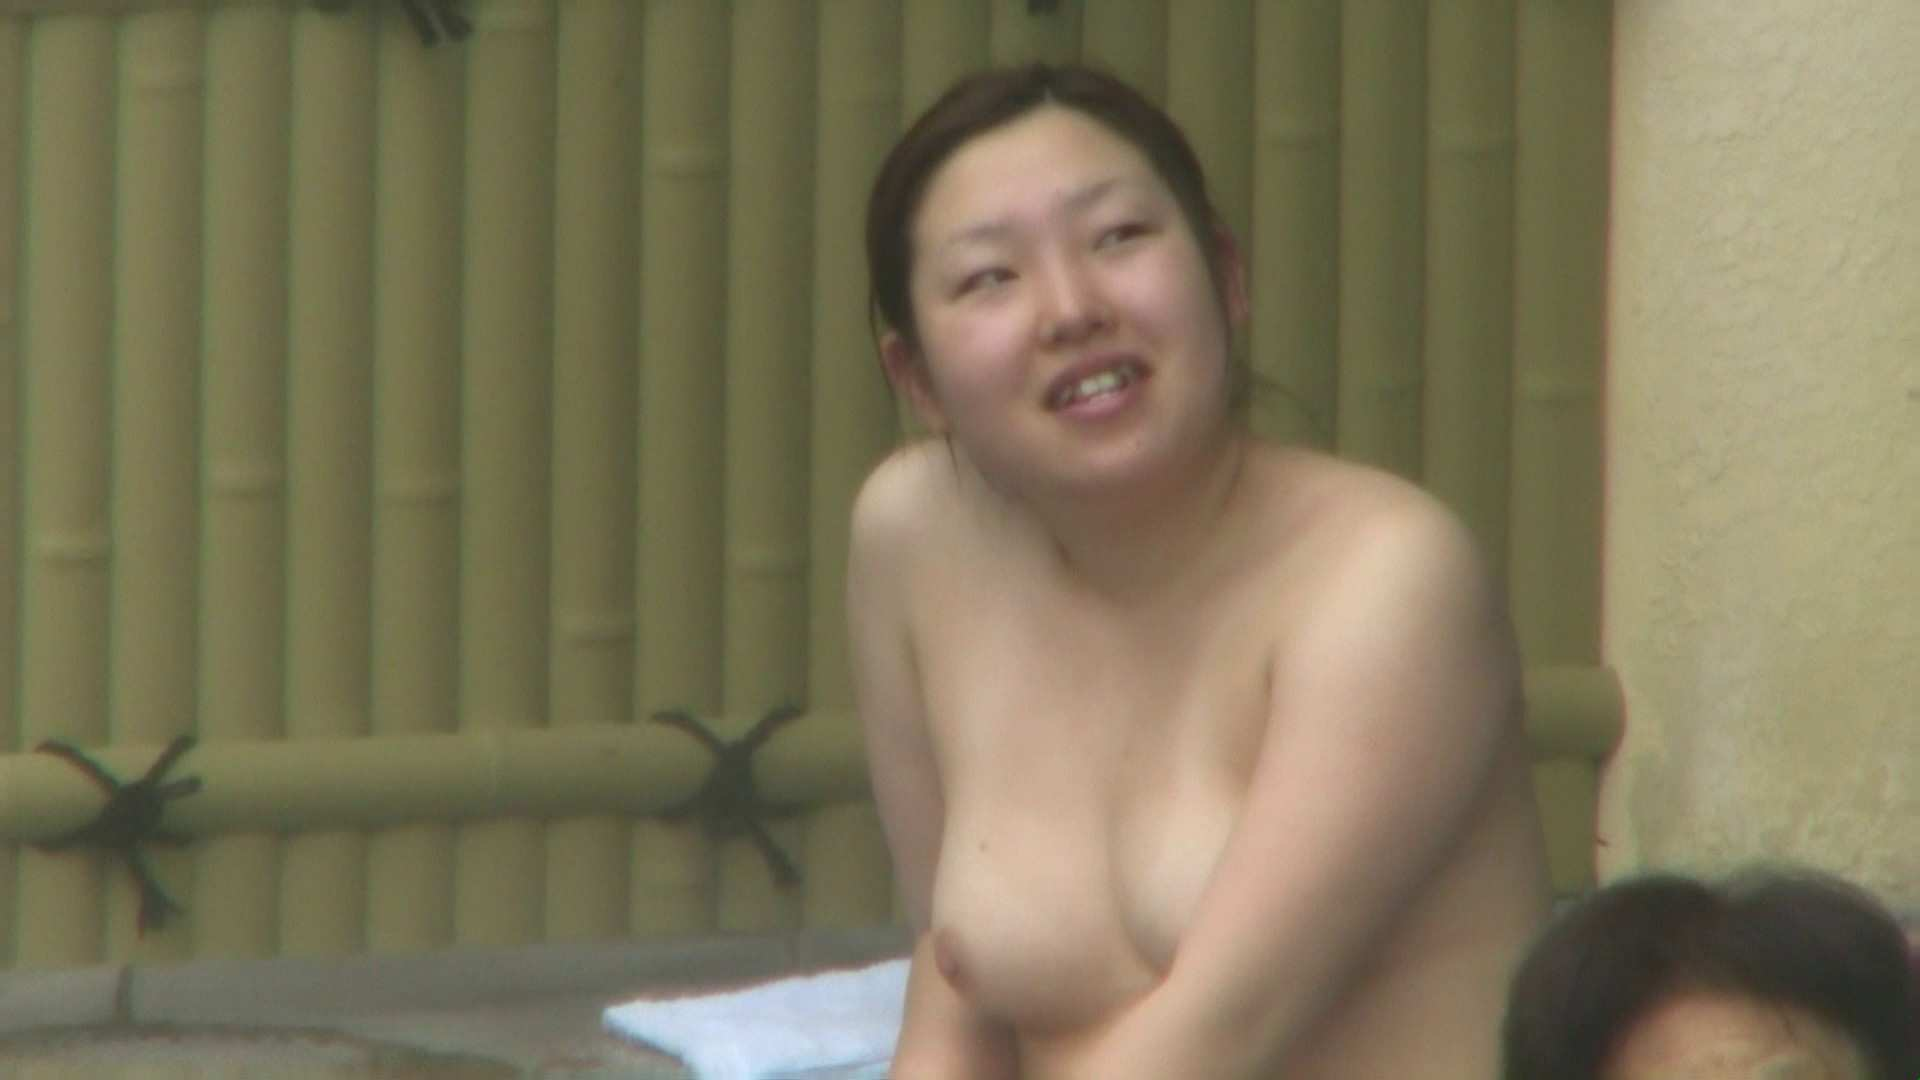 Aquaな露天風呂Vol.72【VIP限定】 0 | 0  47連発 29